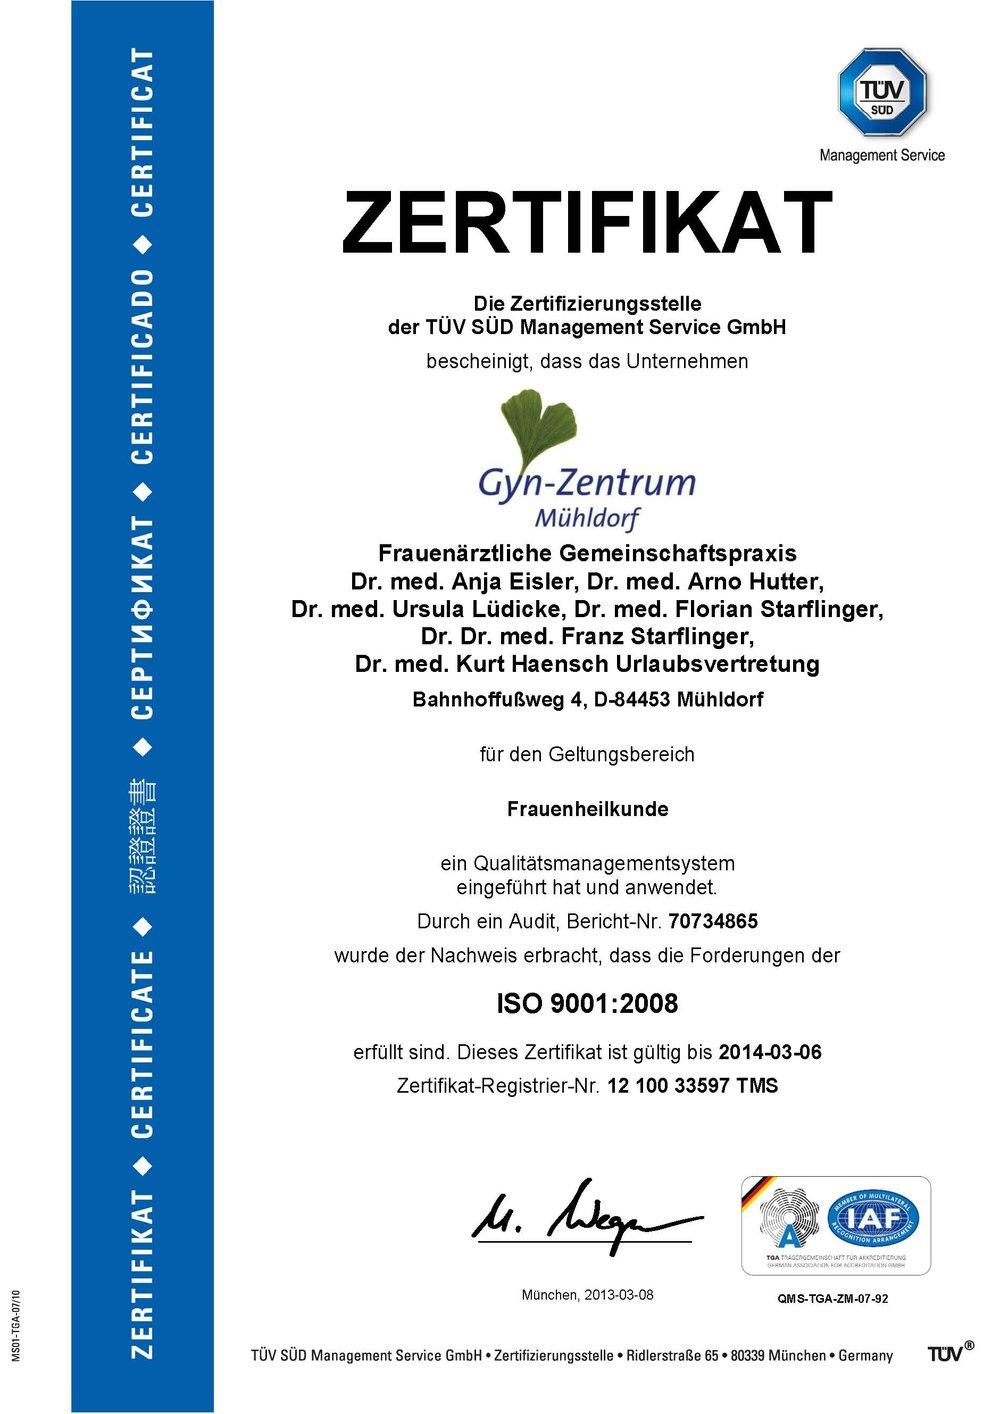 Zertifikat2013.jpg